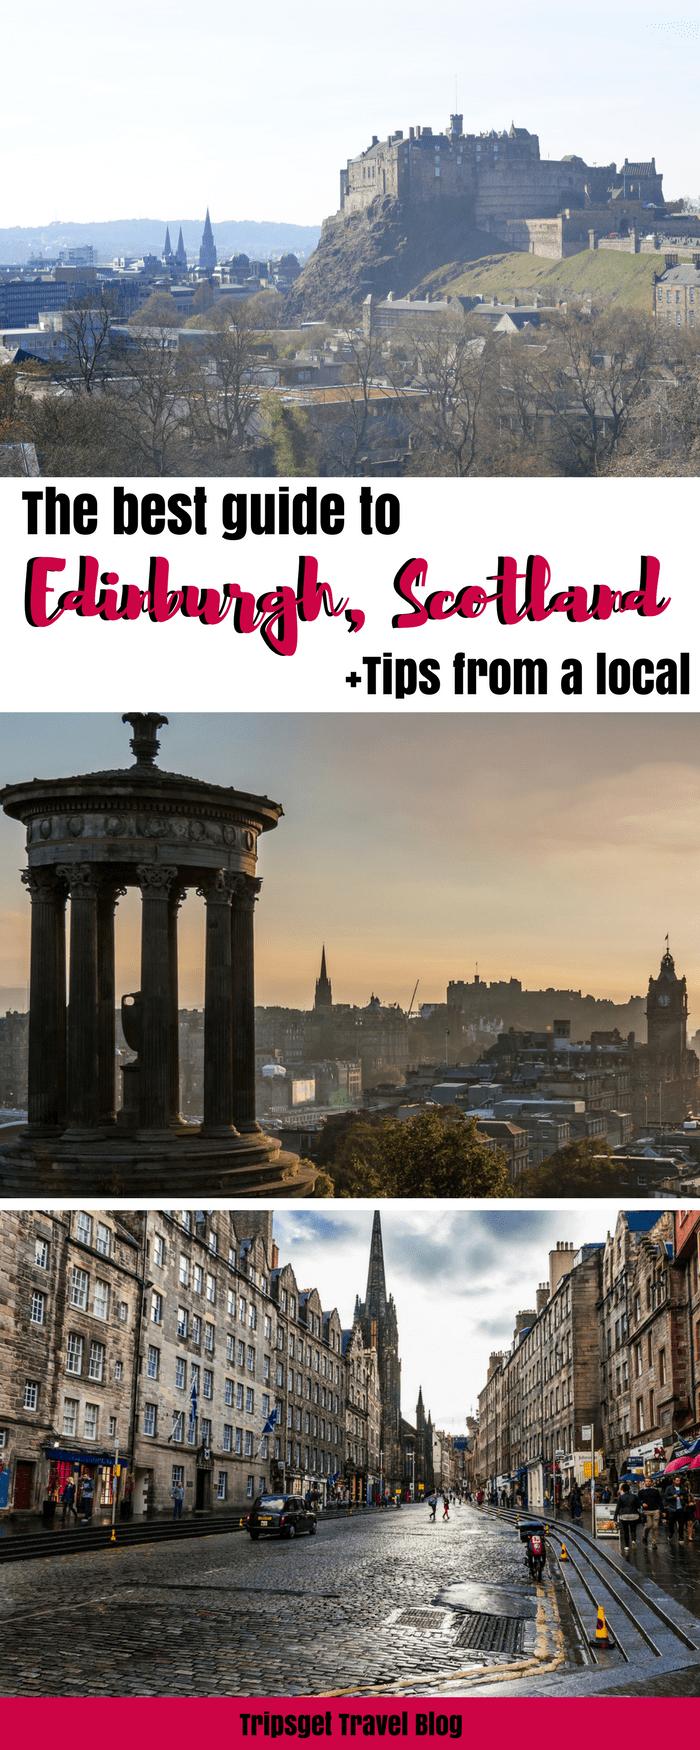 The ultimate guide to Edinburgh, Edinburgh history, Scotland, tips from a local. Edinburgh attractions, Edinburgh travel, Edinburgh castle, Edinburgh Royal Mile, Edinburgh Museums, Edinburgh cafes, Edinburgh food, Edinburgh in summer, Edinburgh in winter